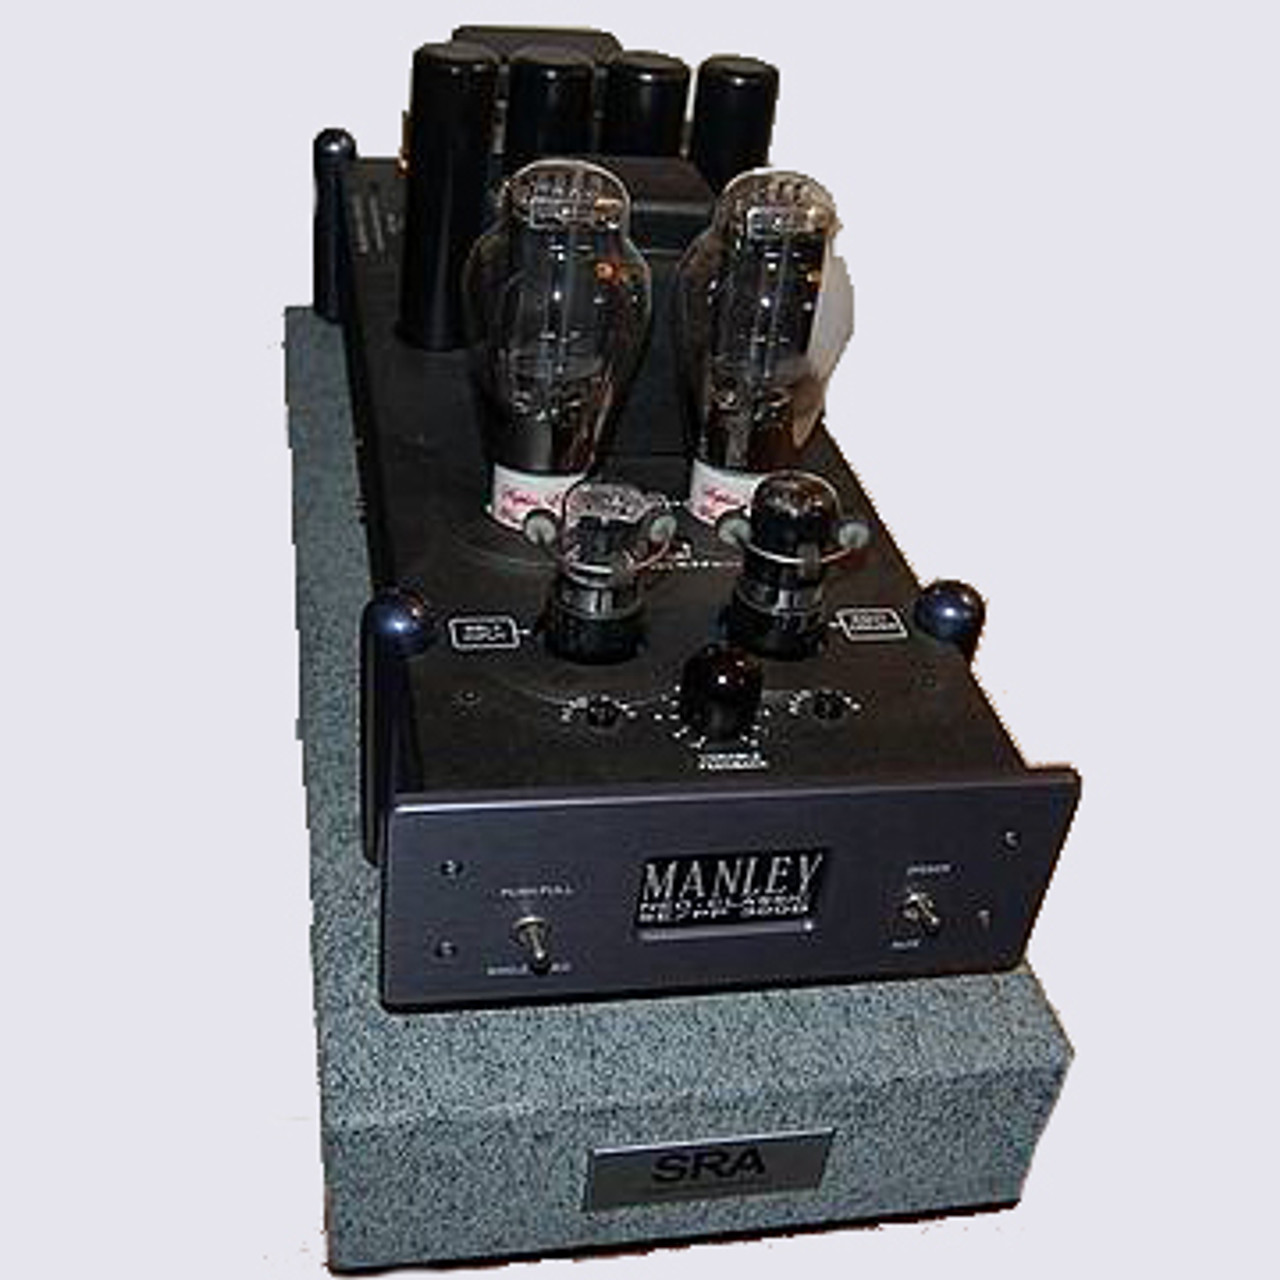 SRA VR series isoBASE platforms for Manley 300B amps